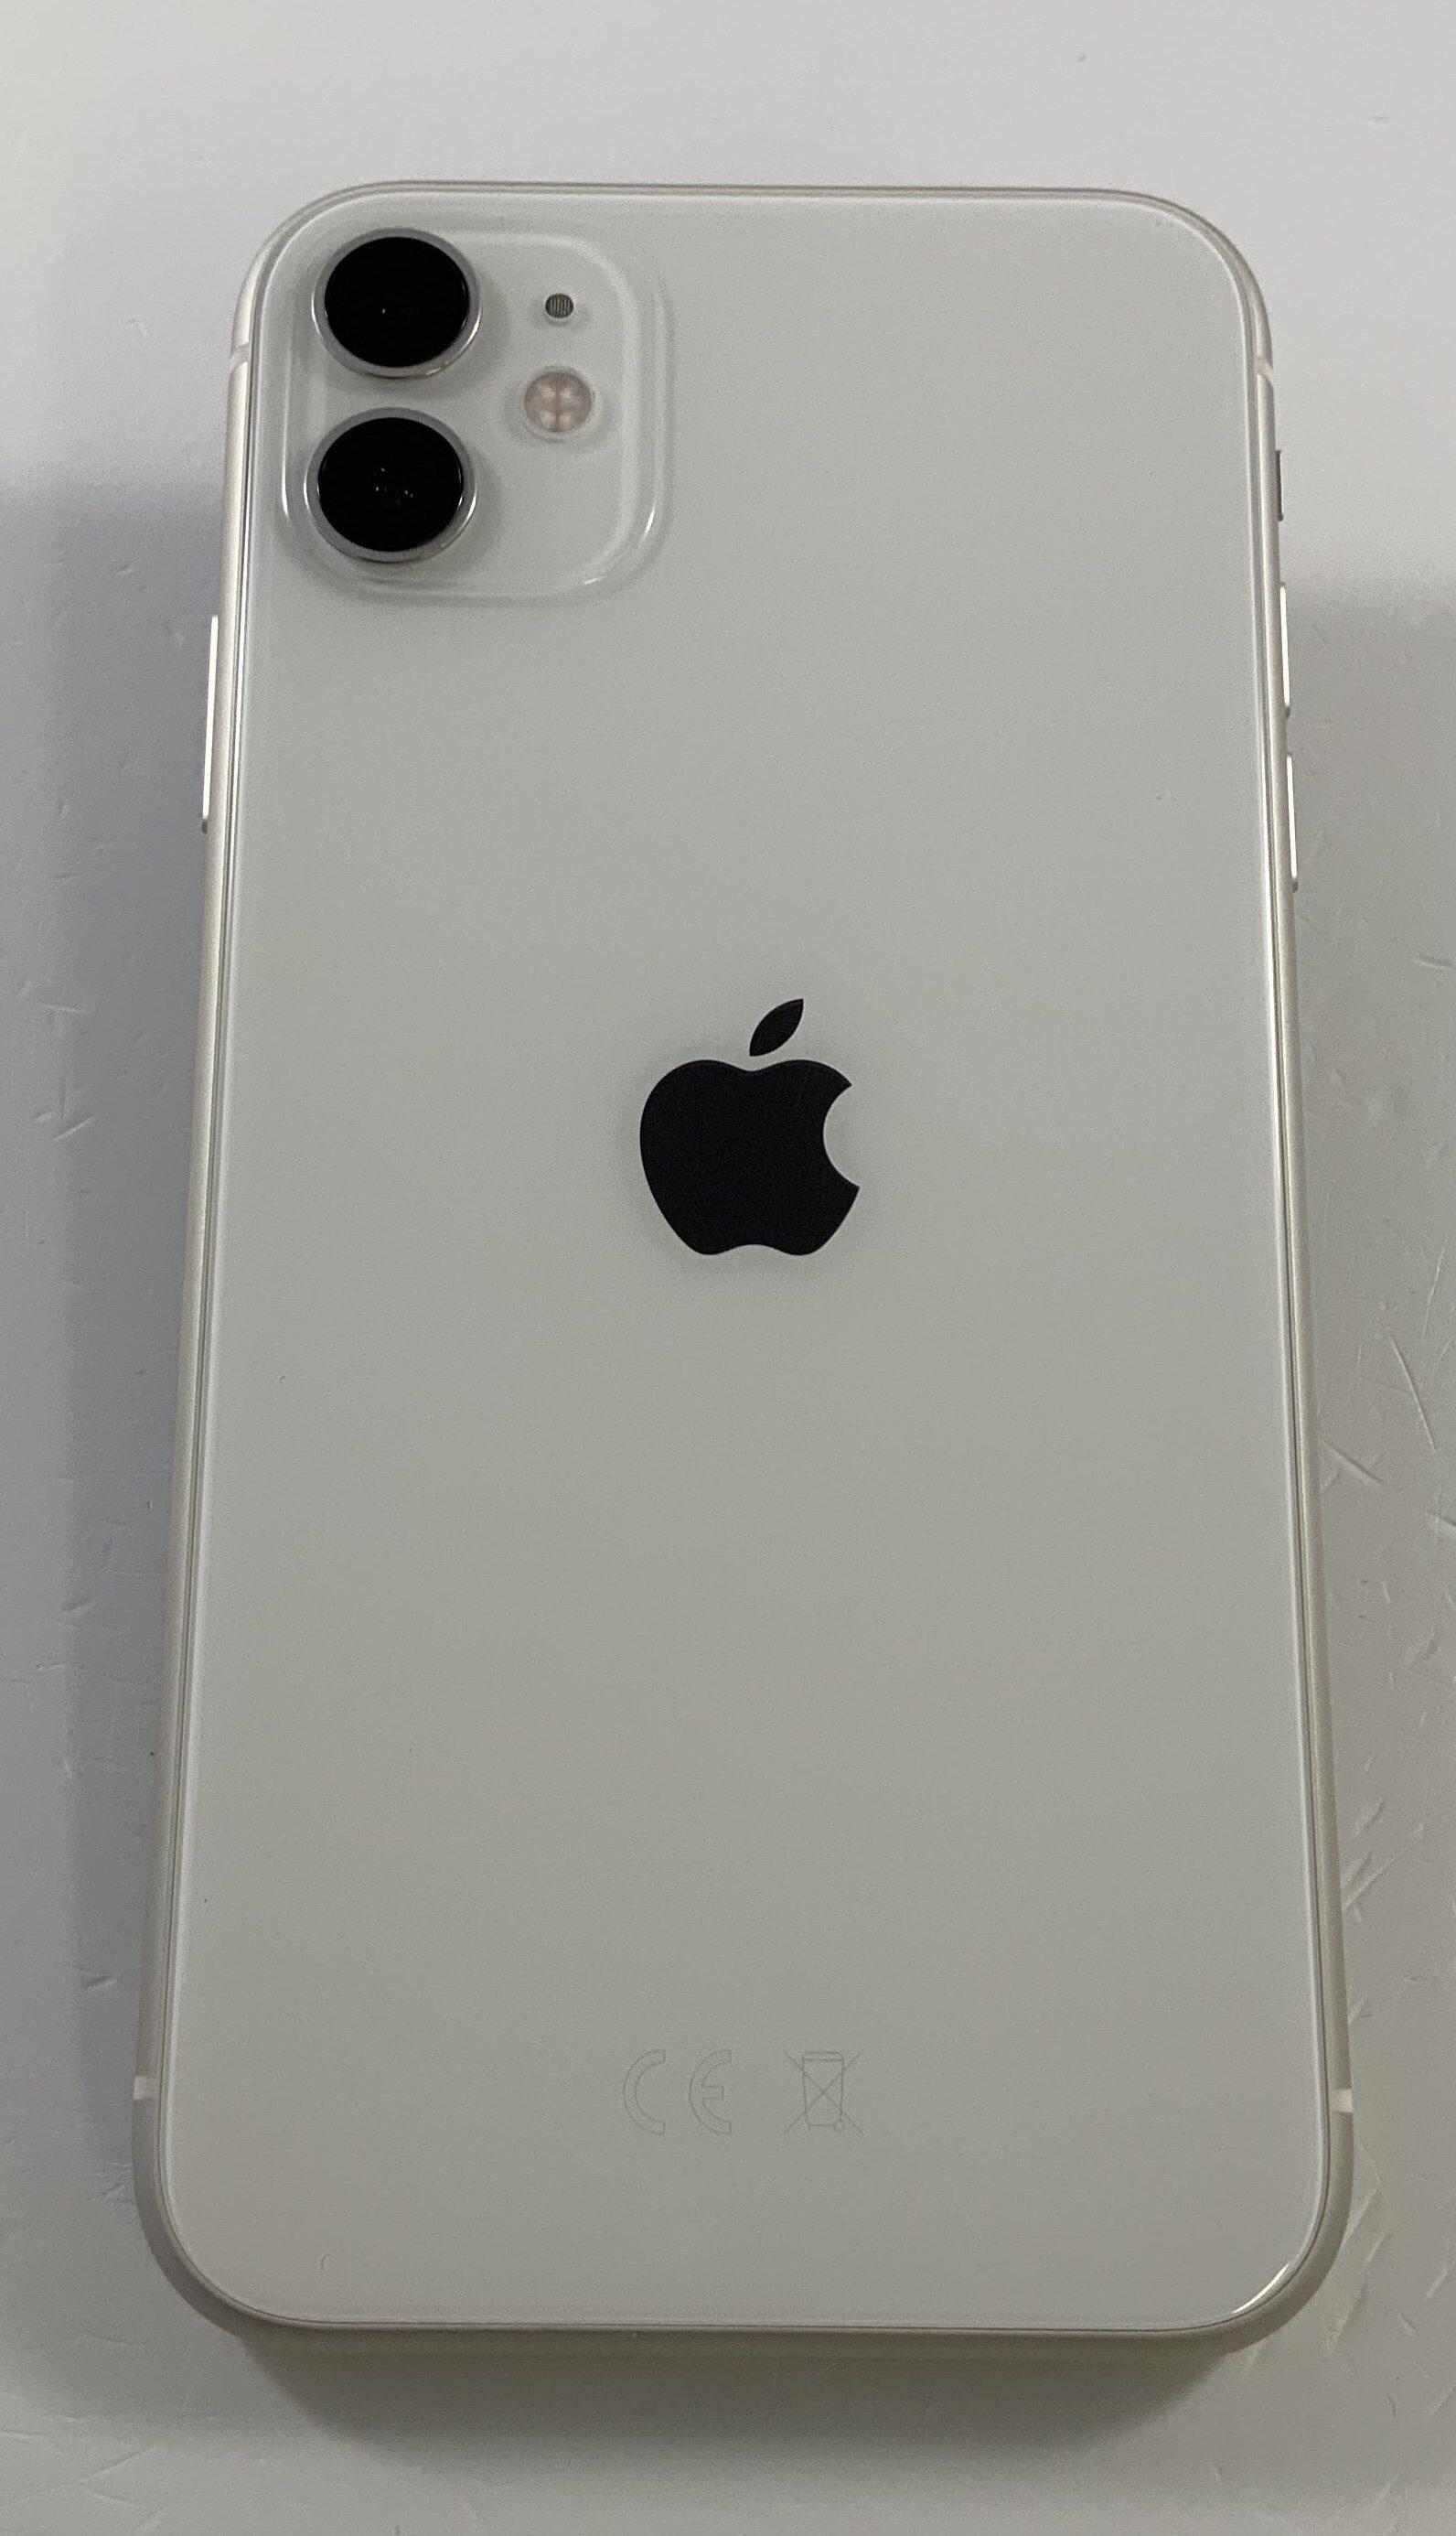 iPhone 11 64GB, 64GB, White, bild 2